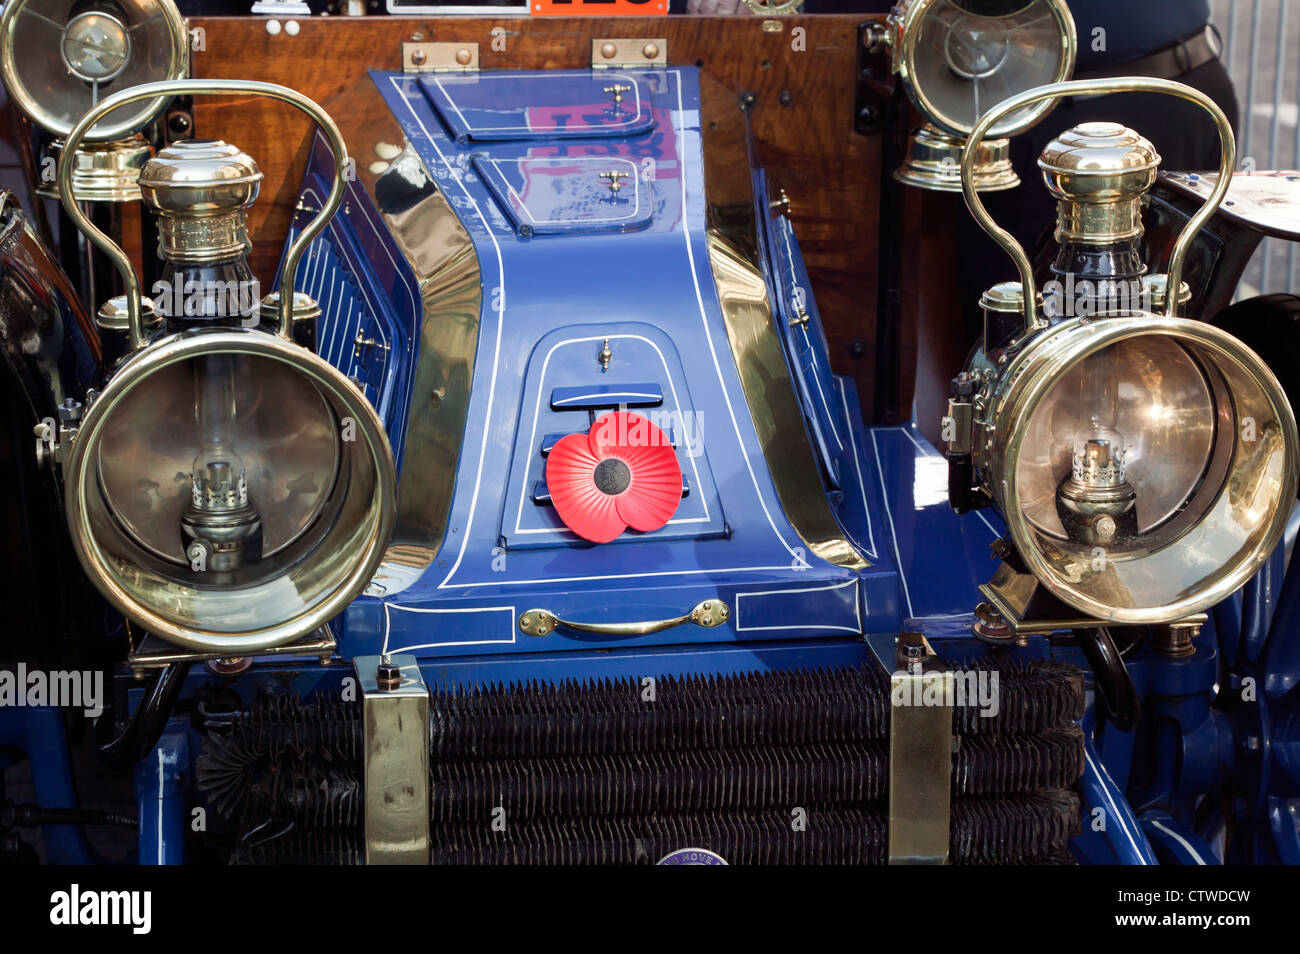 Veteran Car Mors Stock Photos & Veteran Car Mors Stock Images - Alamy